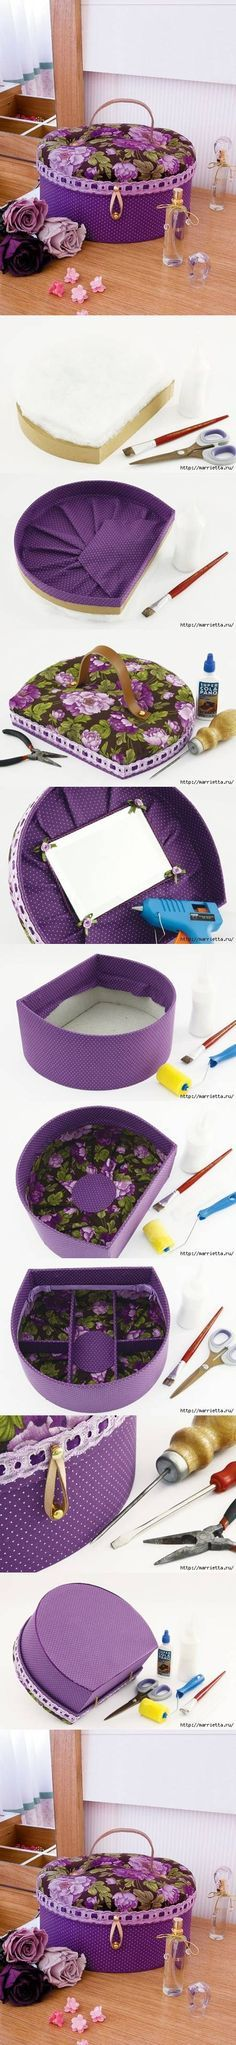 DIY Cute Makeup Box DIY Projects | UsefulDIY.com Follow Us on Facebook ==> http://www.facebook.com/UsefulDiy